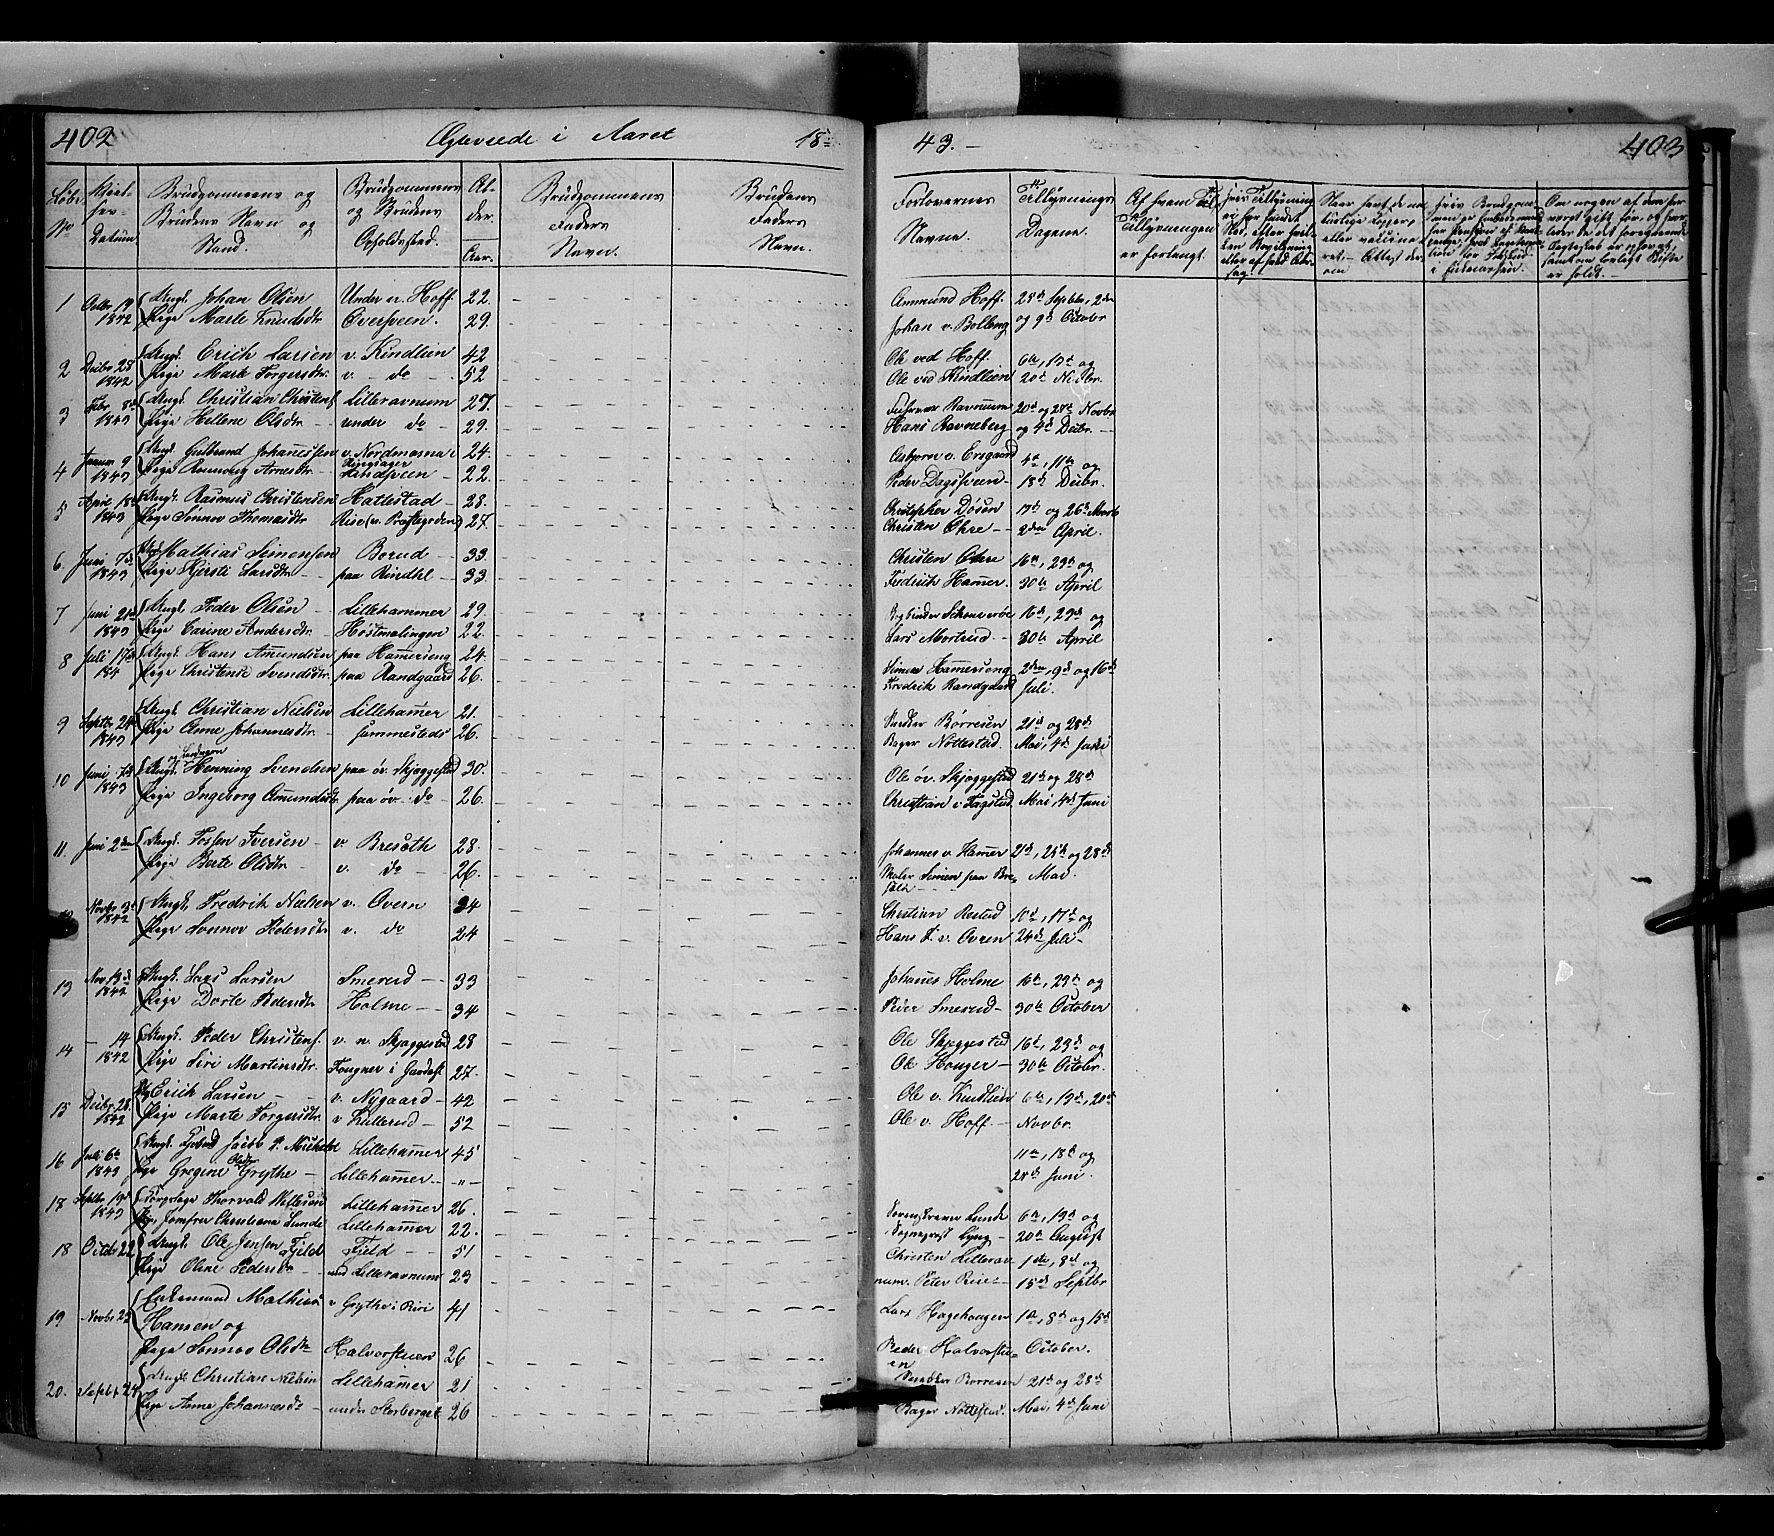 SAH, Fåberg prestekontor, Klokkerbok nr. 6, 1837-1855, s. 402-403